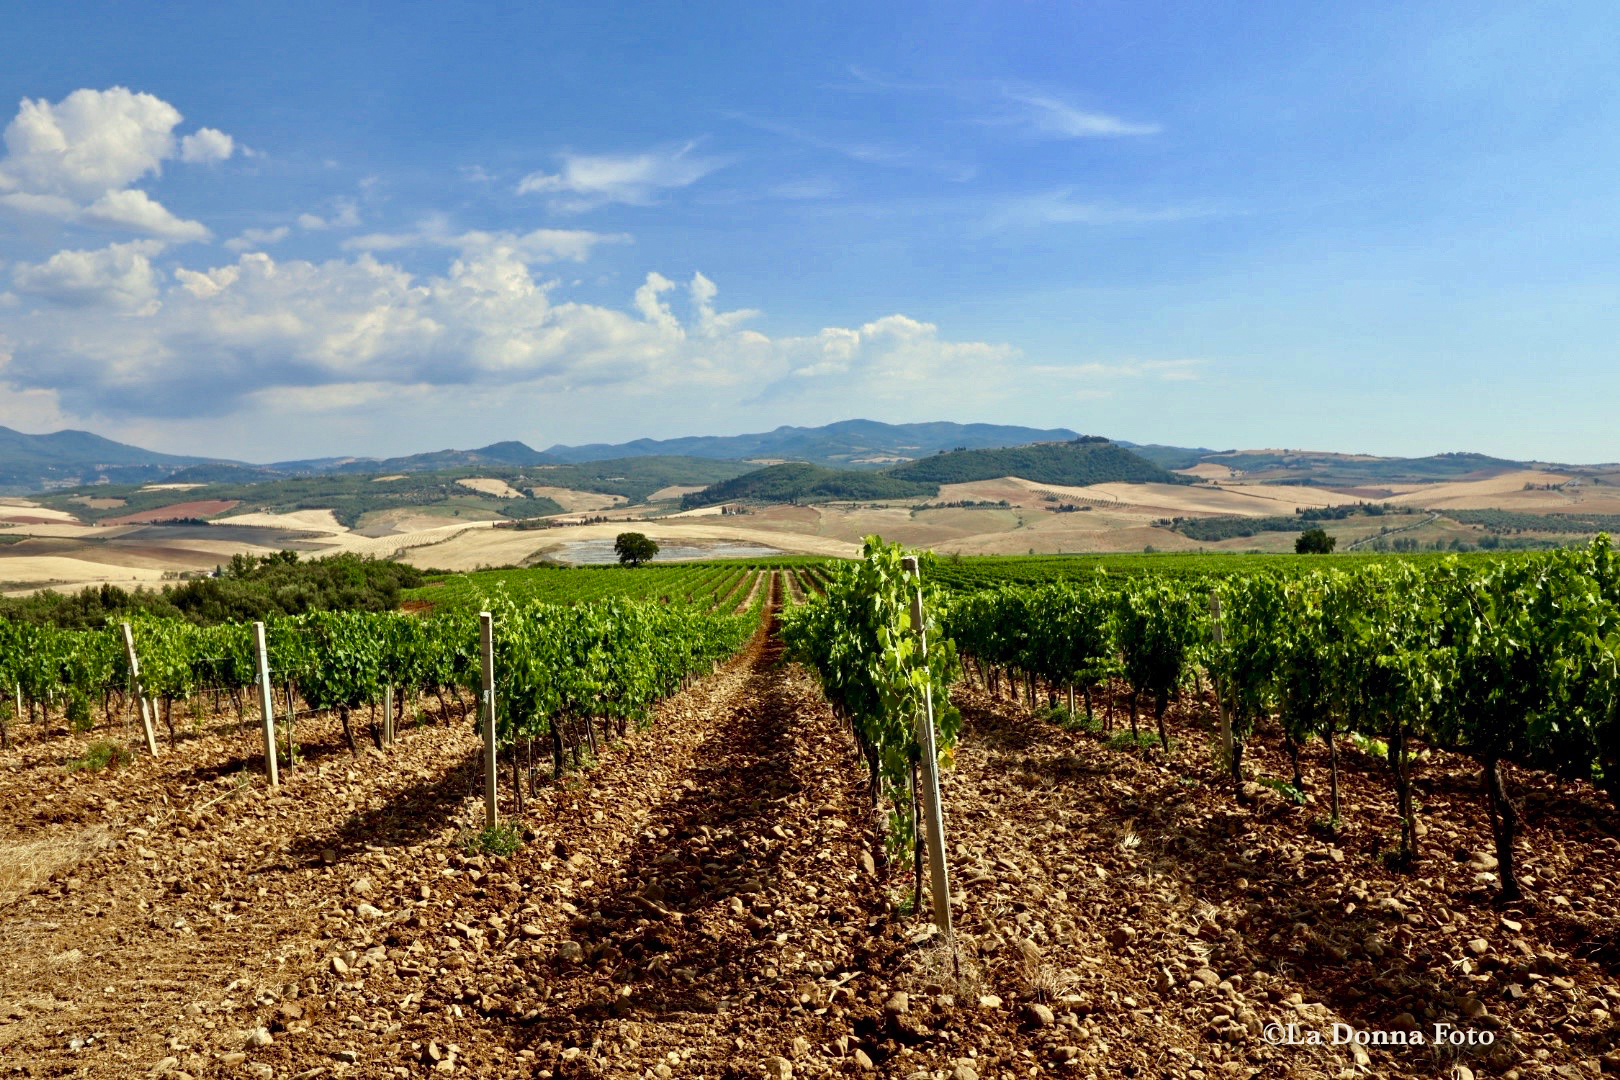 Summer Tuscan Vineyard - Beautiful International Landscape Photography - La Donna Foto - LaDonnaFoto.com